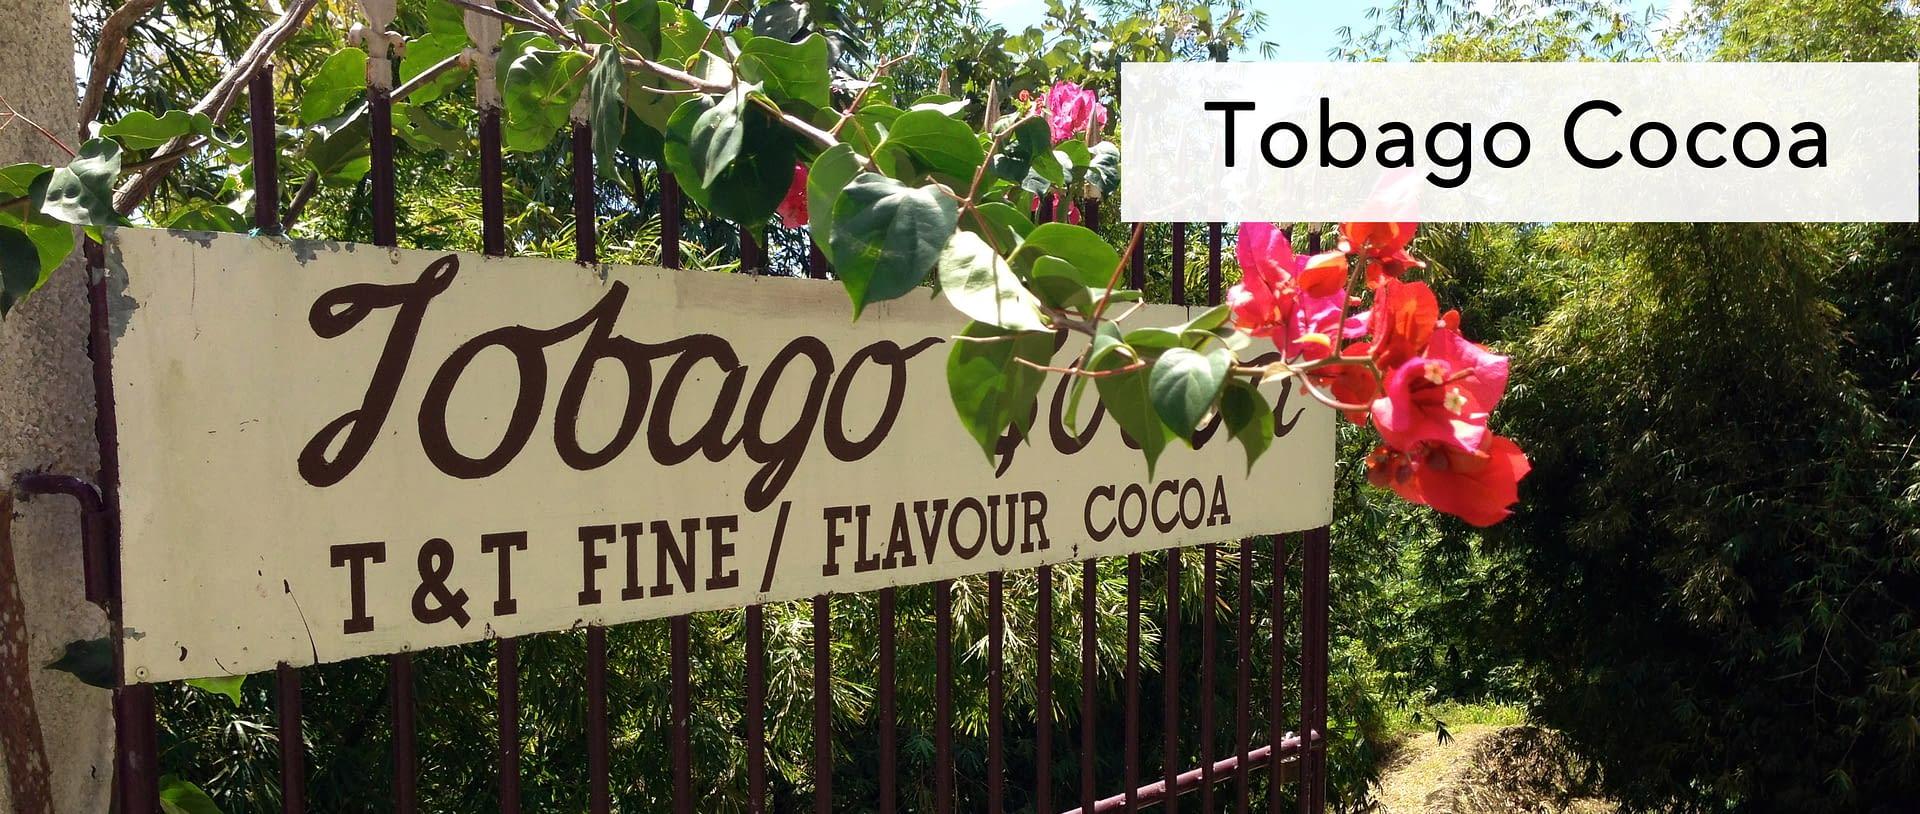 Tobago Cocoa